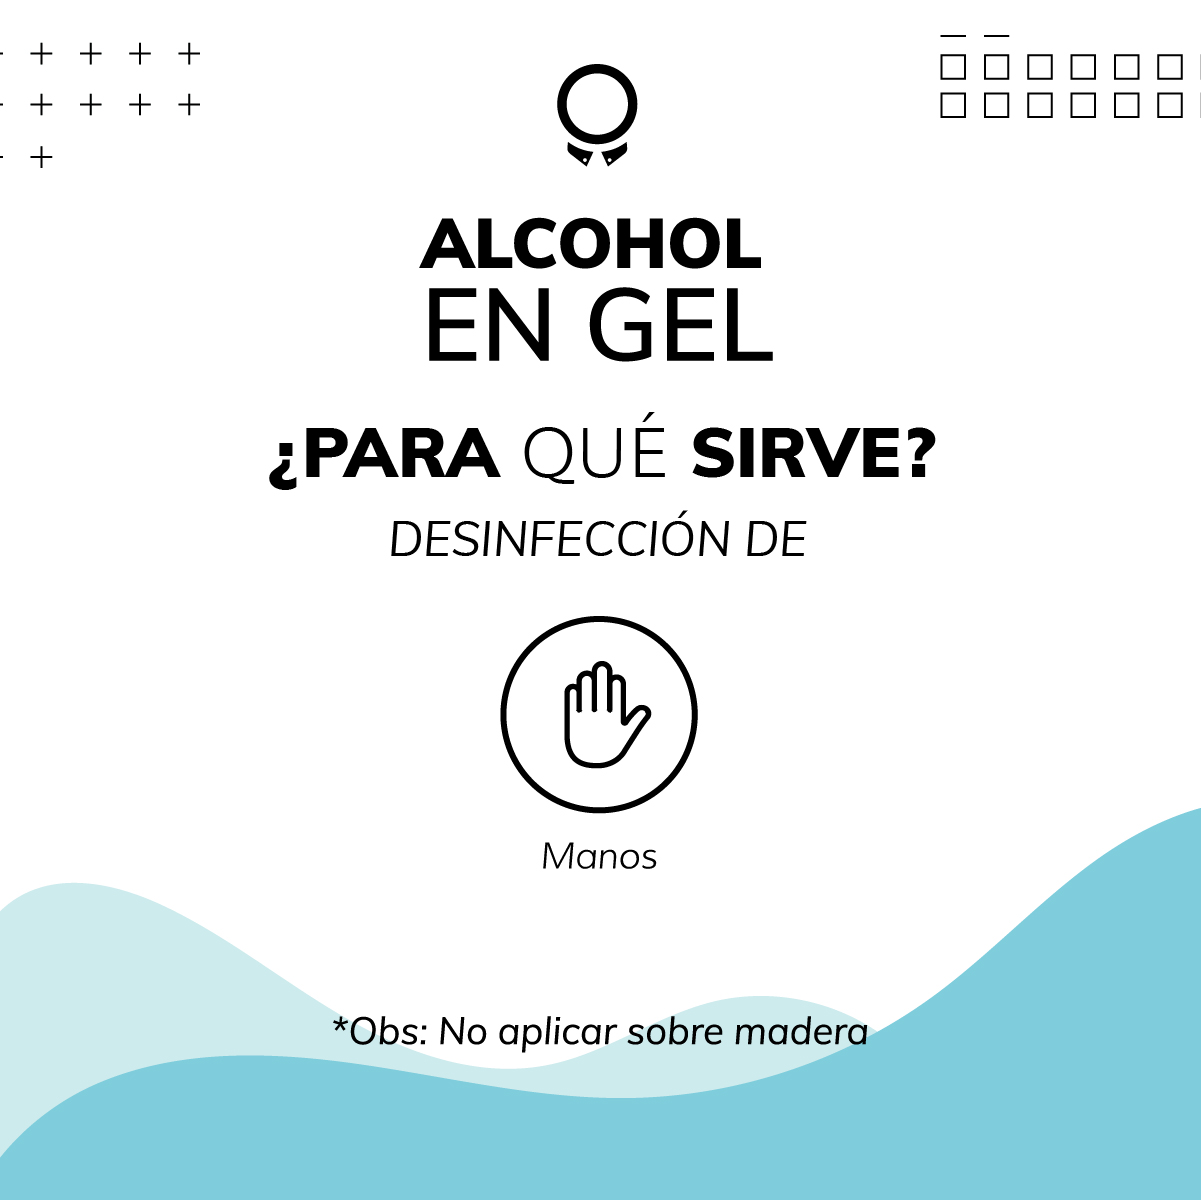 ALCOHOL EN GEL LIBERATO 140ML